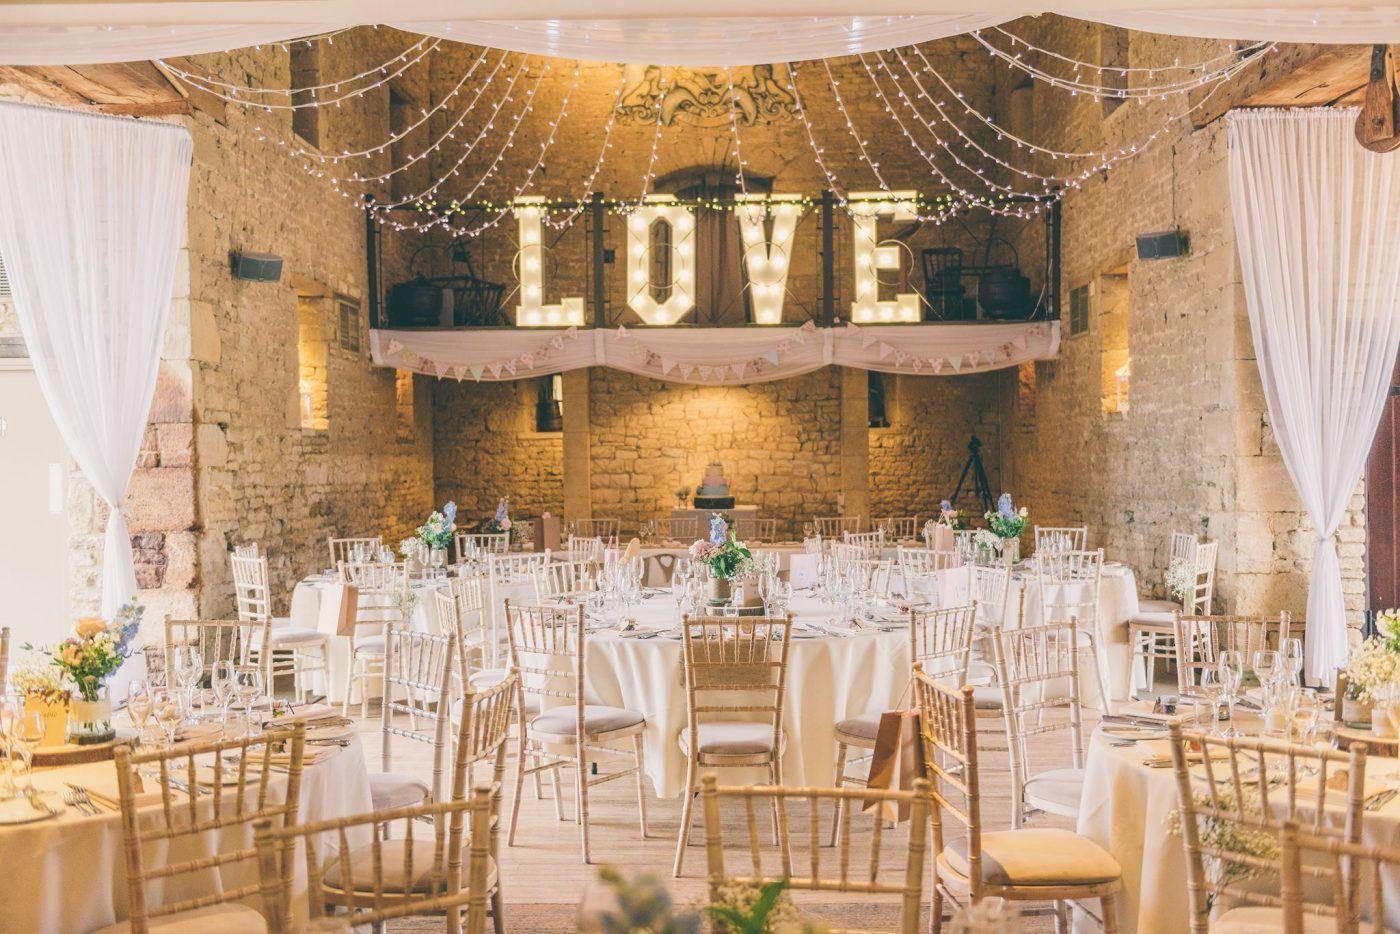 The Great Tythe Barn Wedding Venue Gloucestershire Wedinspire Barnweddings The Great Tythe Barn Wedding V Wedding Venues Uk Barn Wedding Barn Wedding Venue